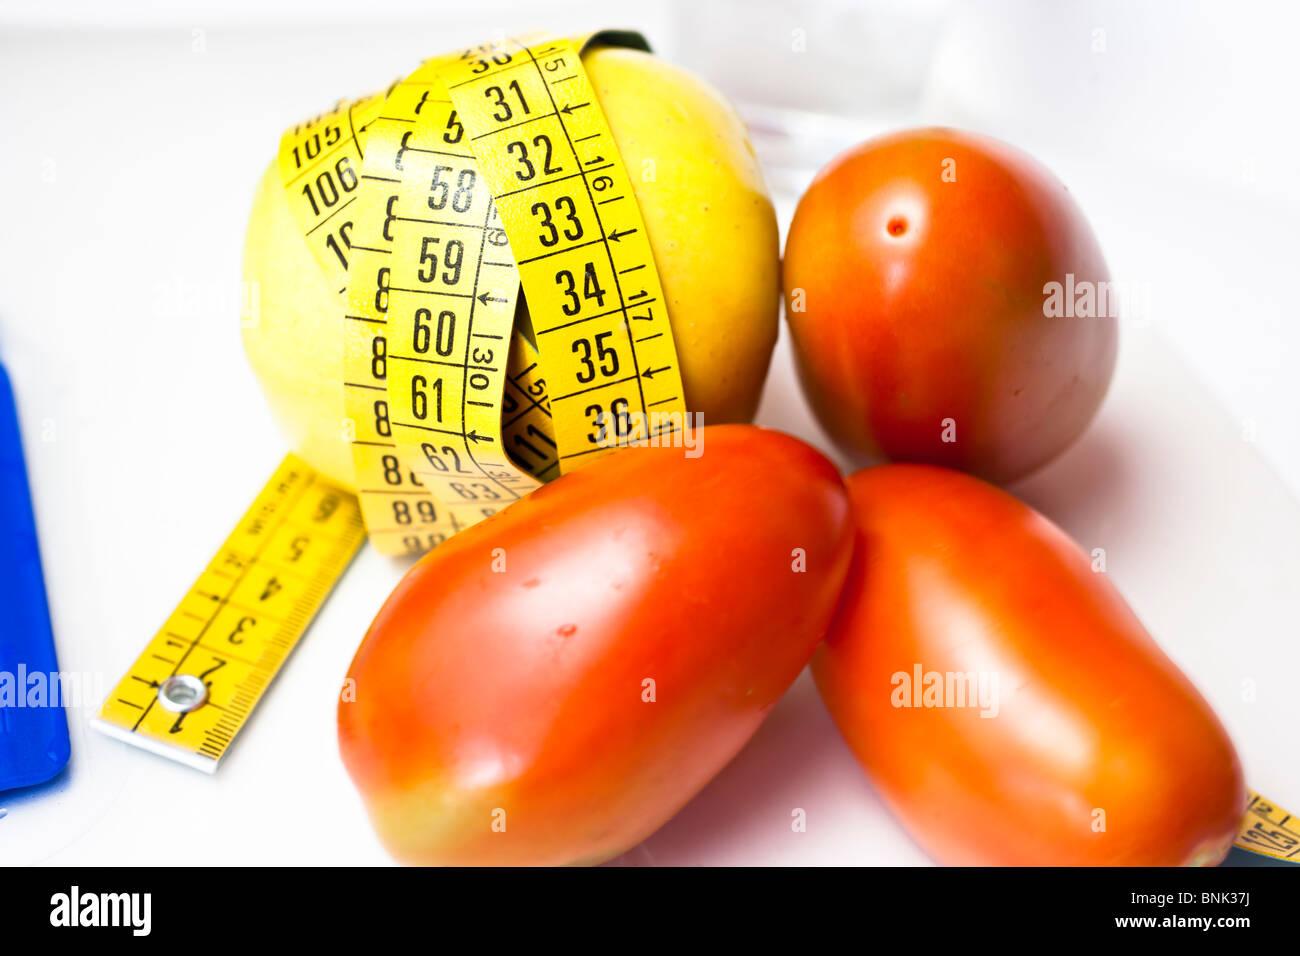 tomatoes diet - Stock Image